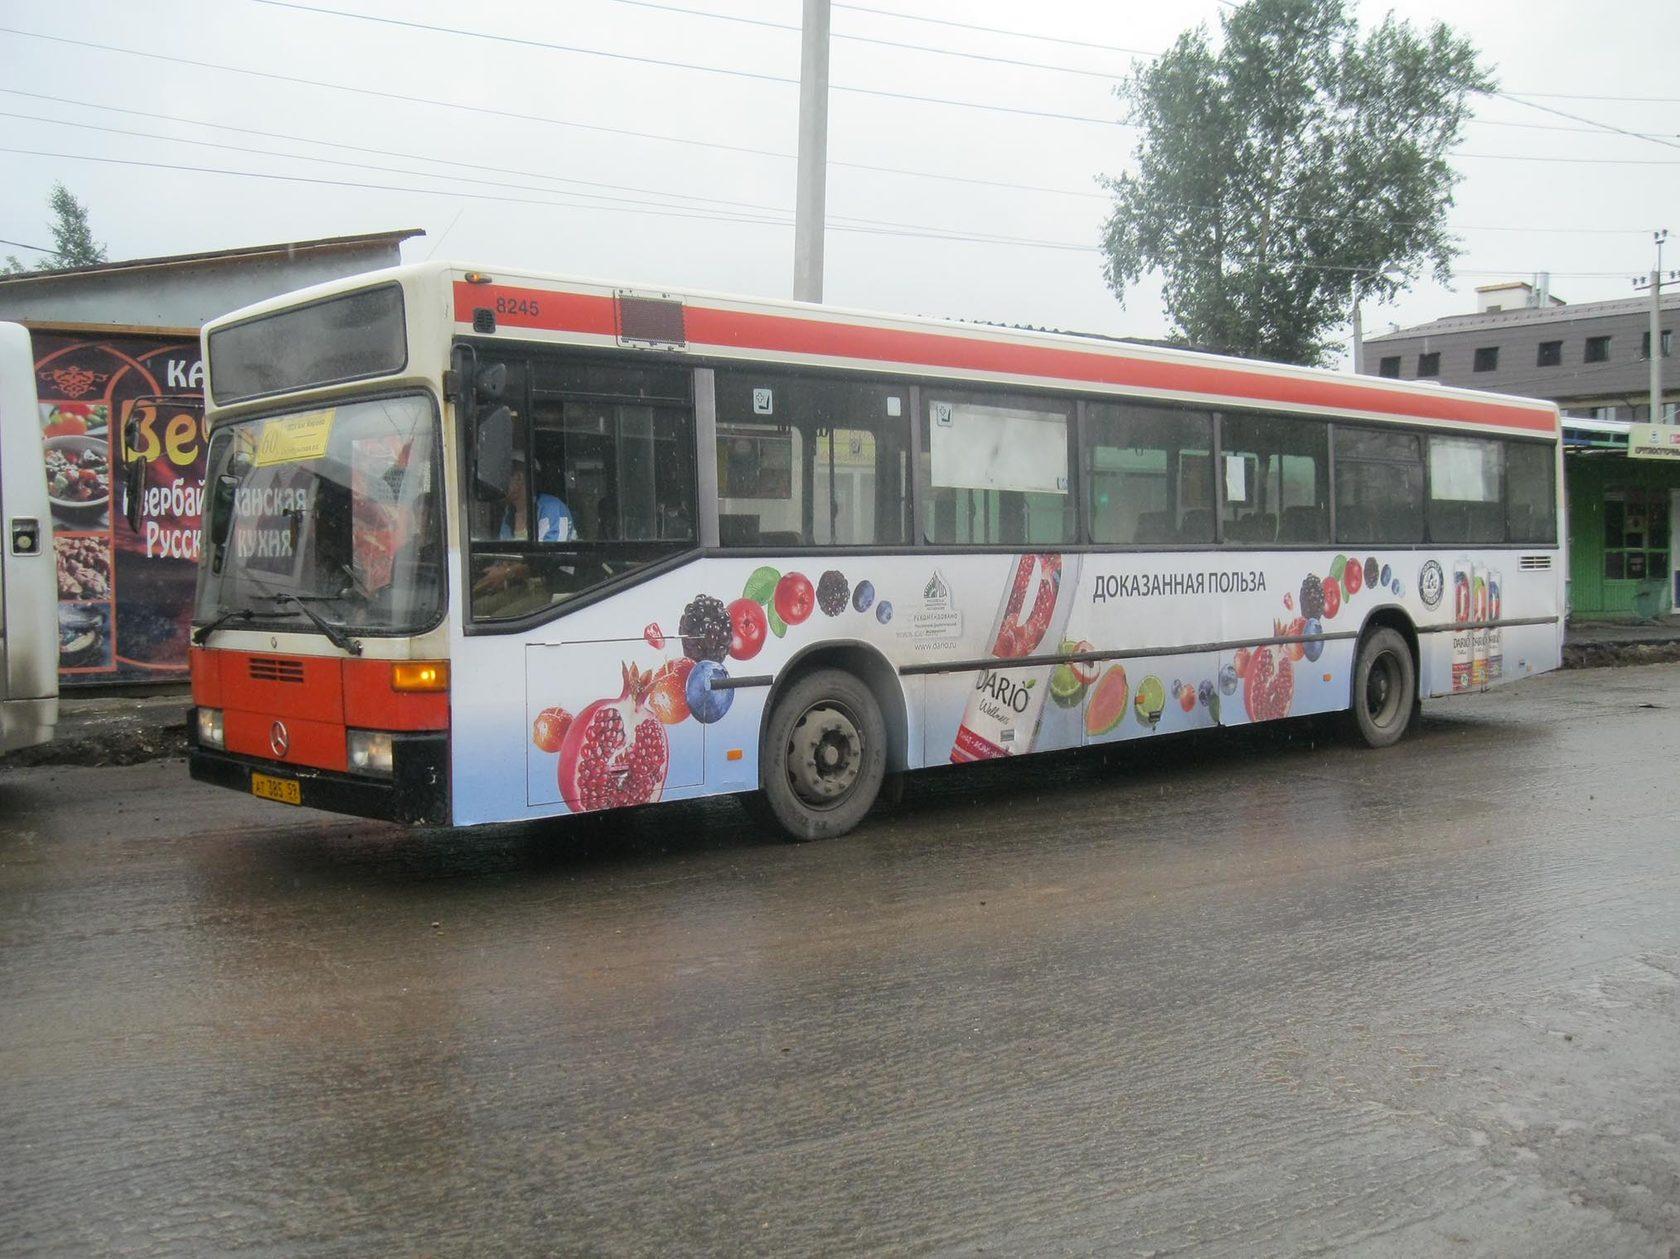 реклама на автобусах перми фото данному факту